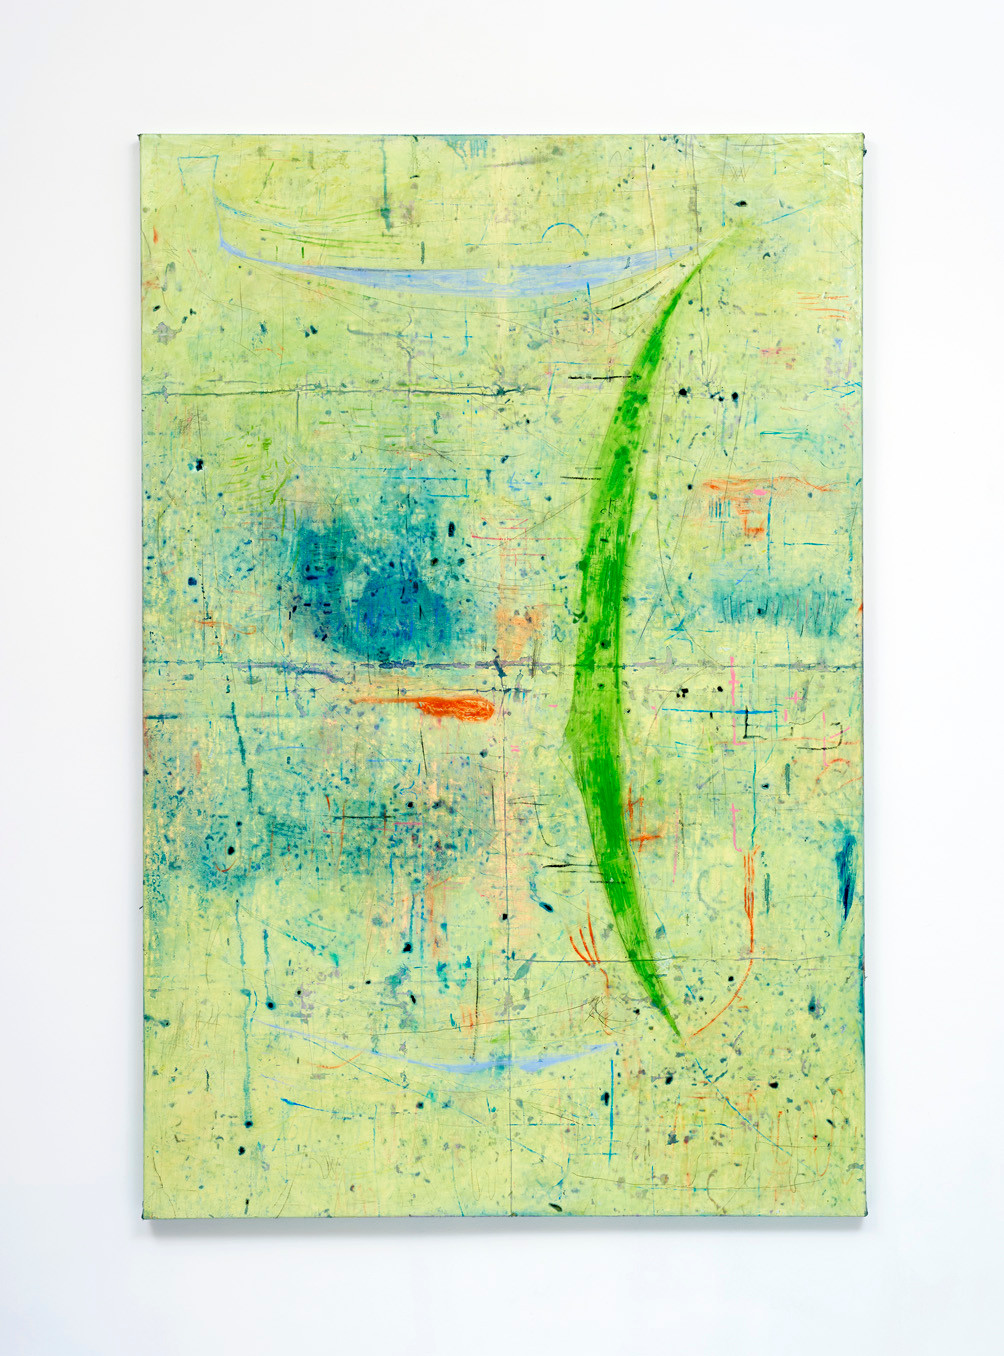 ~ Piss bottle desert father. 2015-18. oil paint, pastel and graphite on linen. 180 x 120 cm